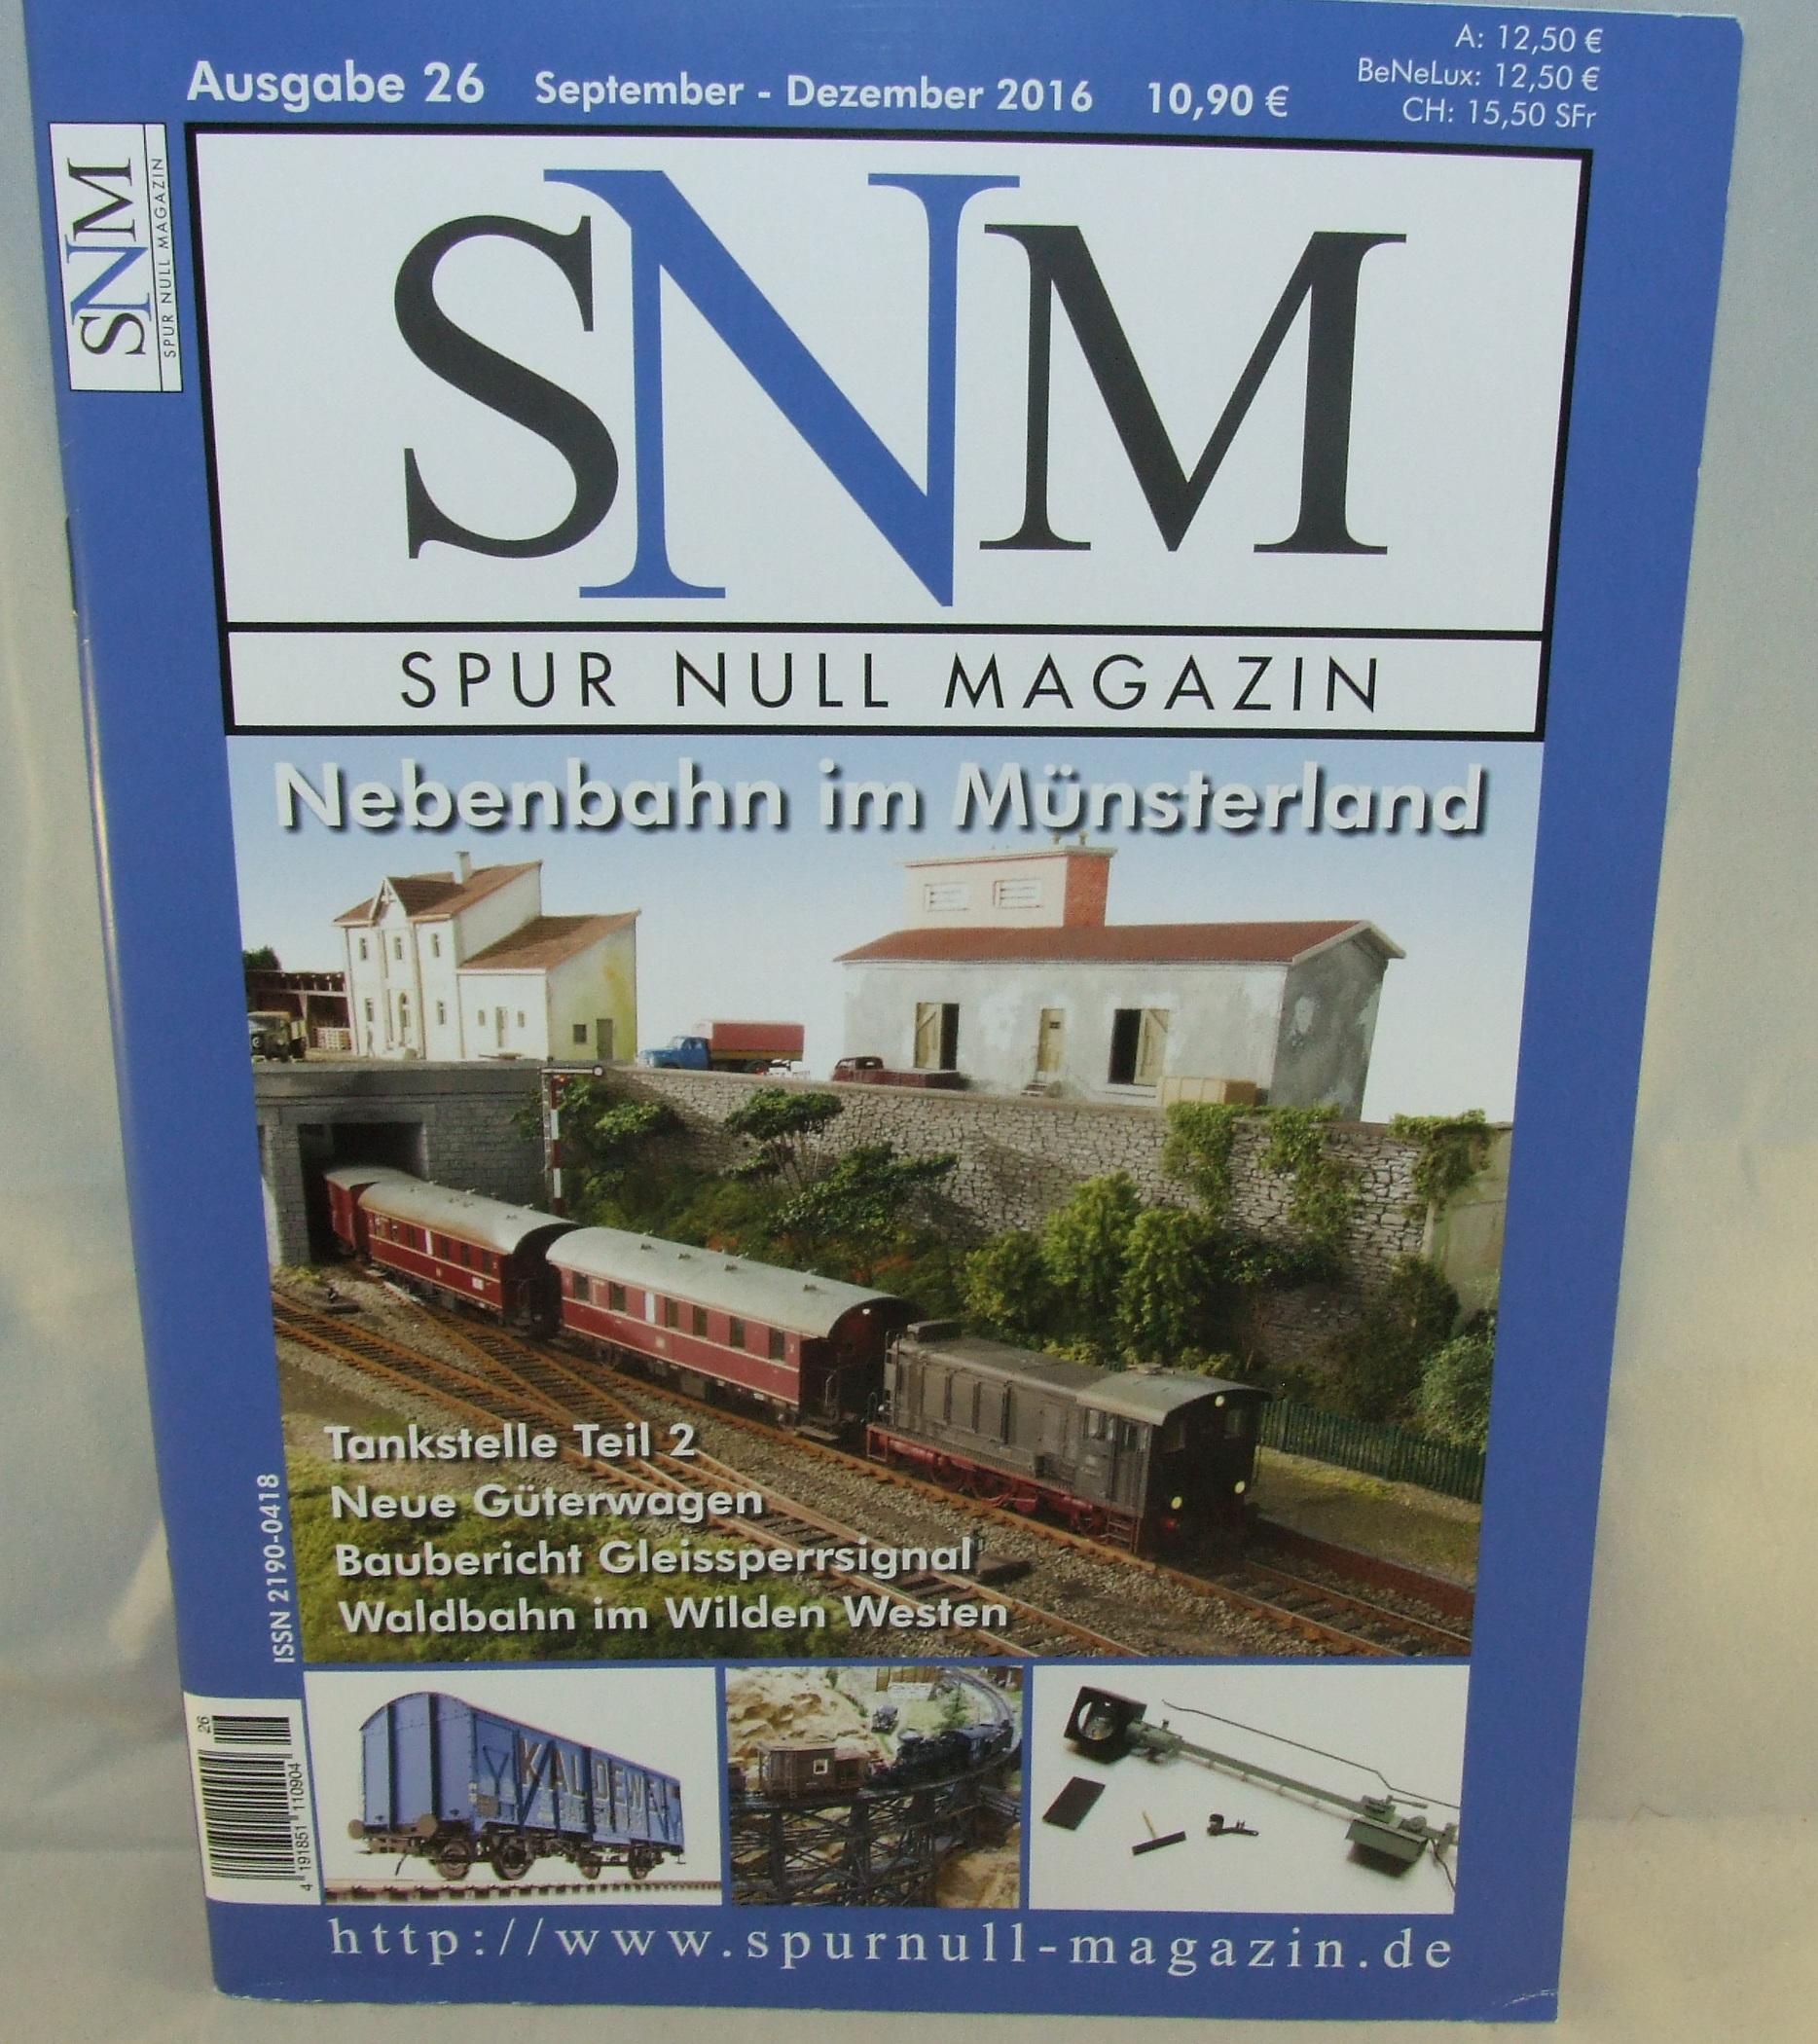 Einzelheft Ausgabe 26 September - Dezember  2016 Spur Null Magazin